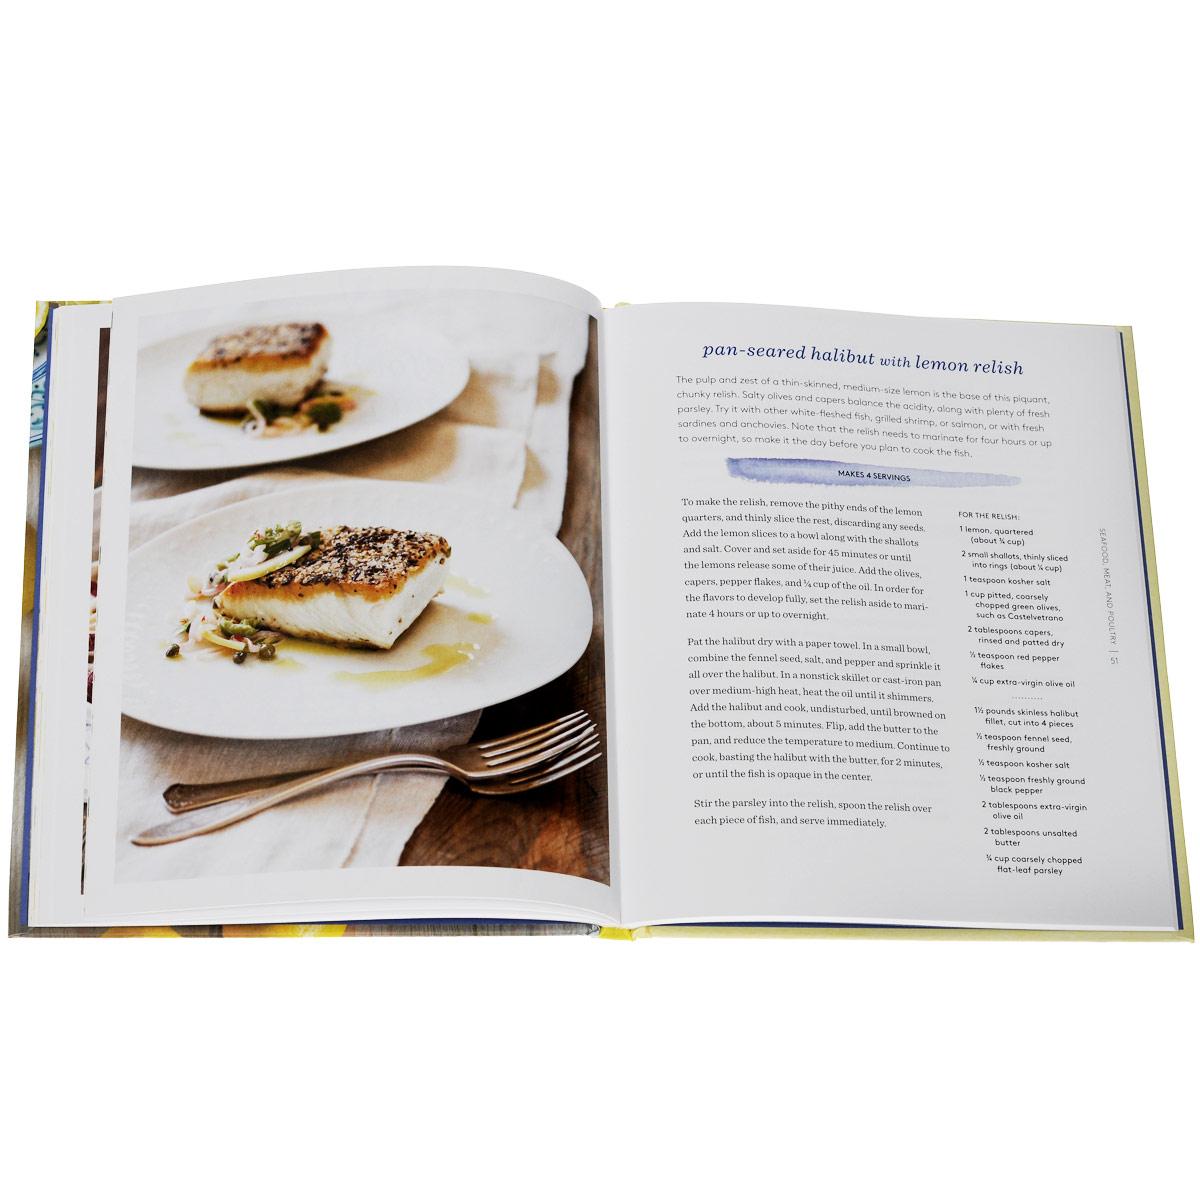 Ellen Jackson. The Lemon Cookbook: 50 Sweet & Savory Recipes to Brighten Every Meal